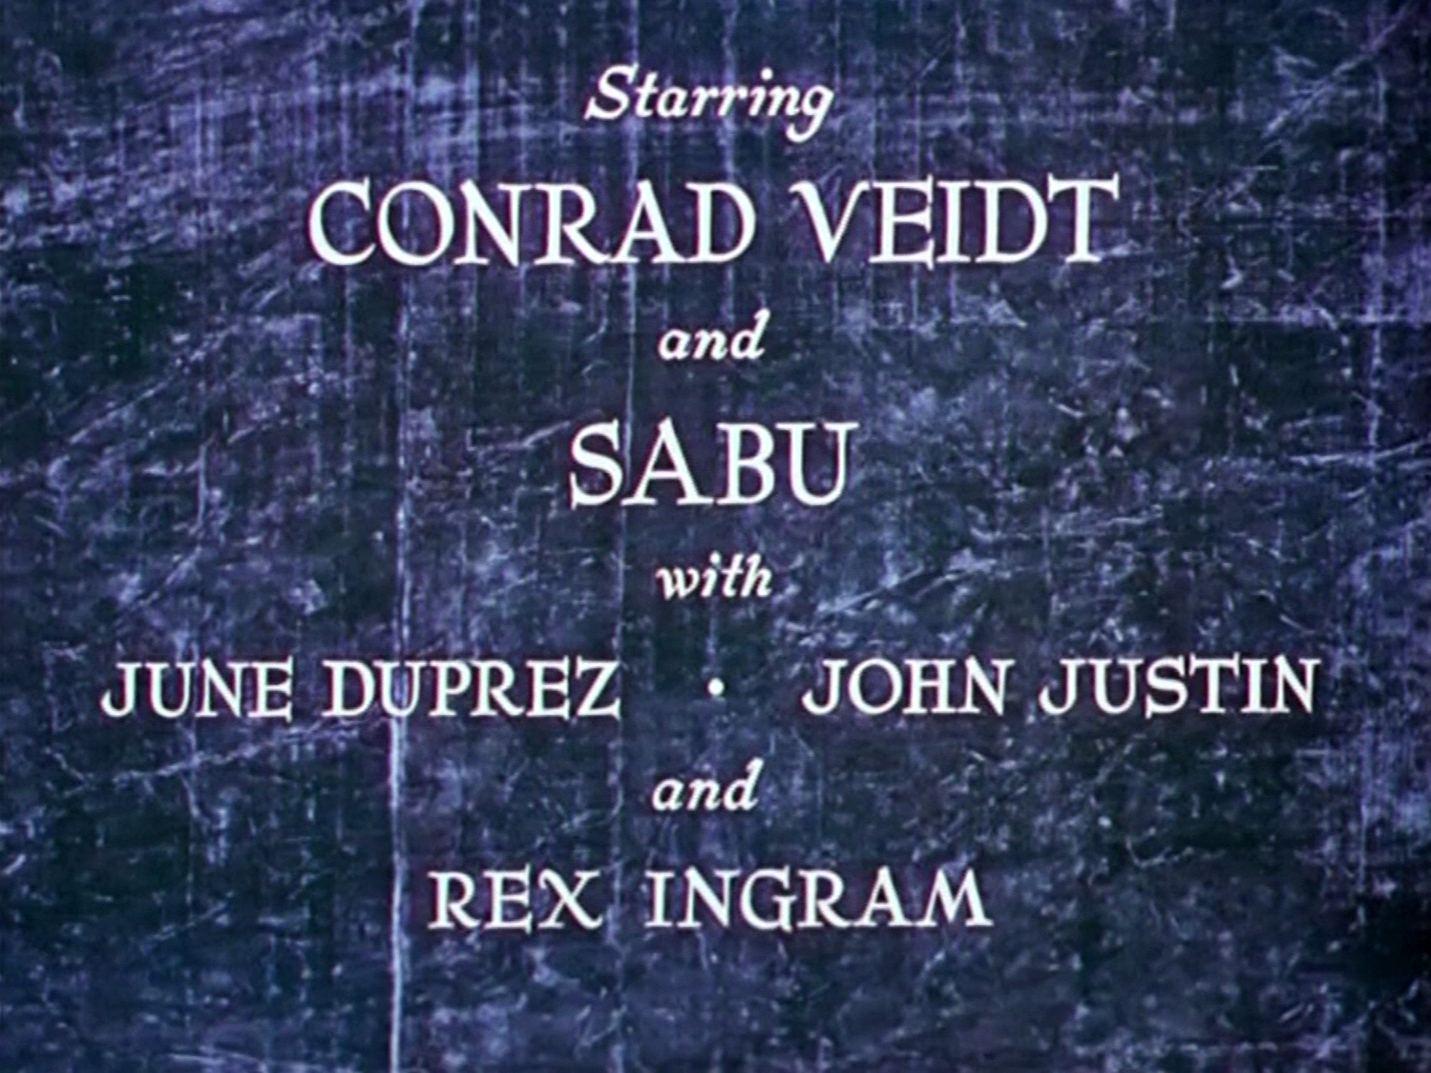 Main title from The Thief of Bagdad (1940) (3). Sabu, Conrad Veidt, June Duprez, John Justin, Rex Ingram